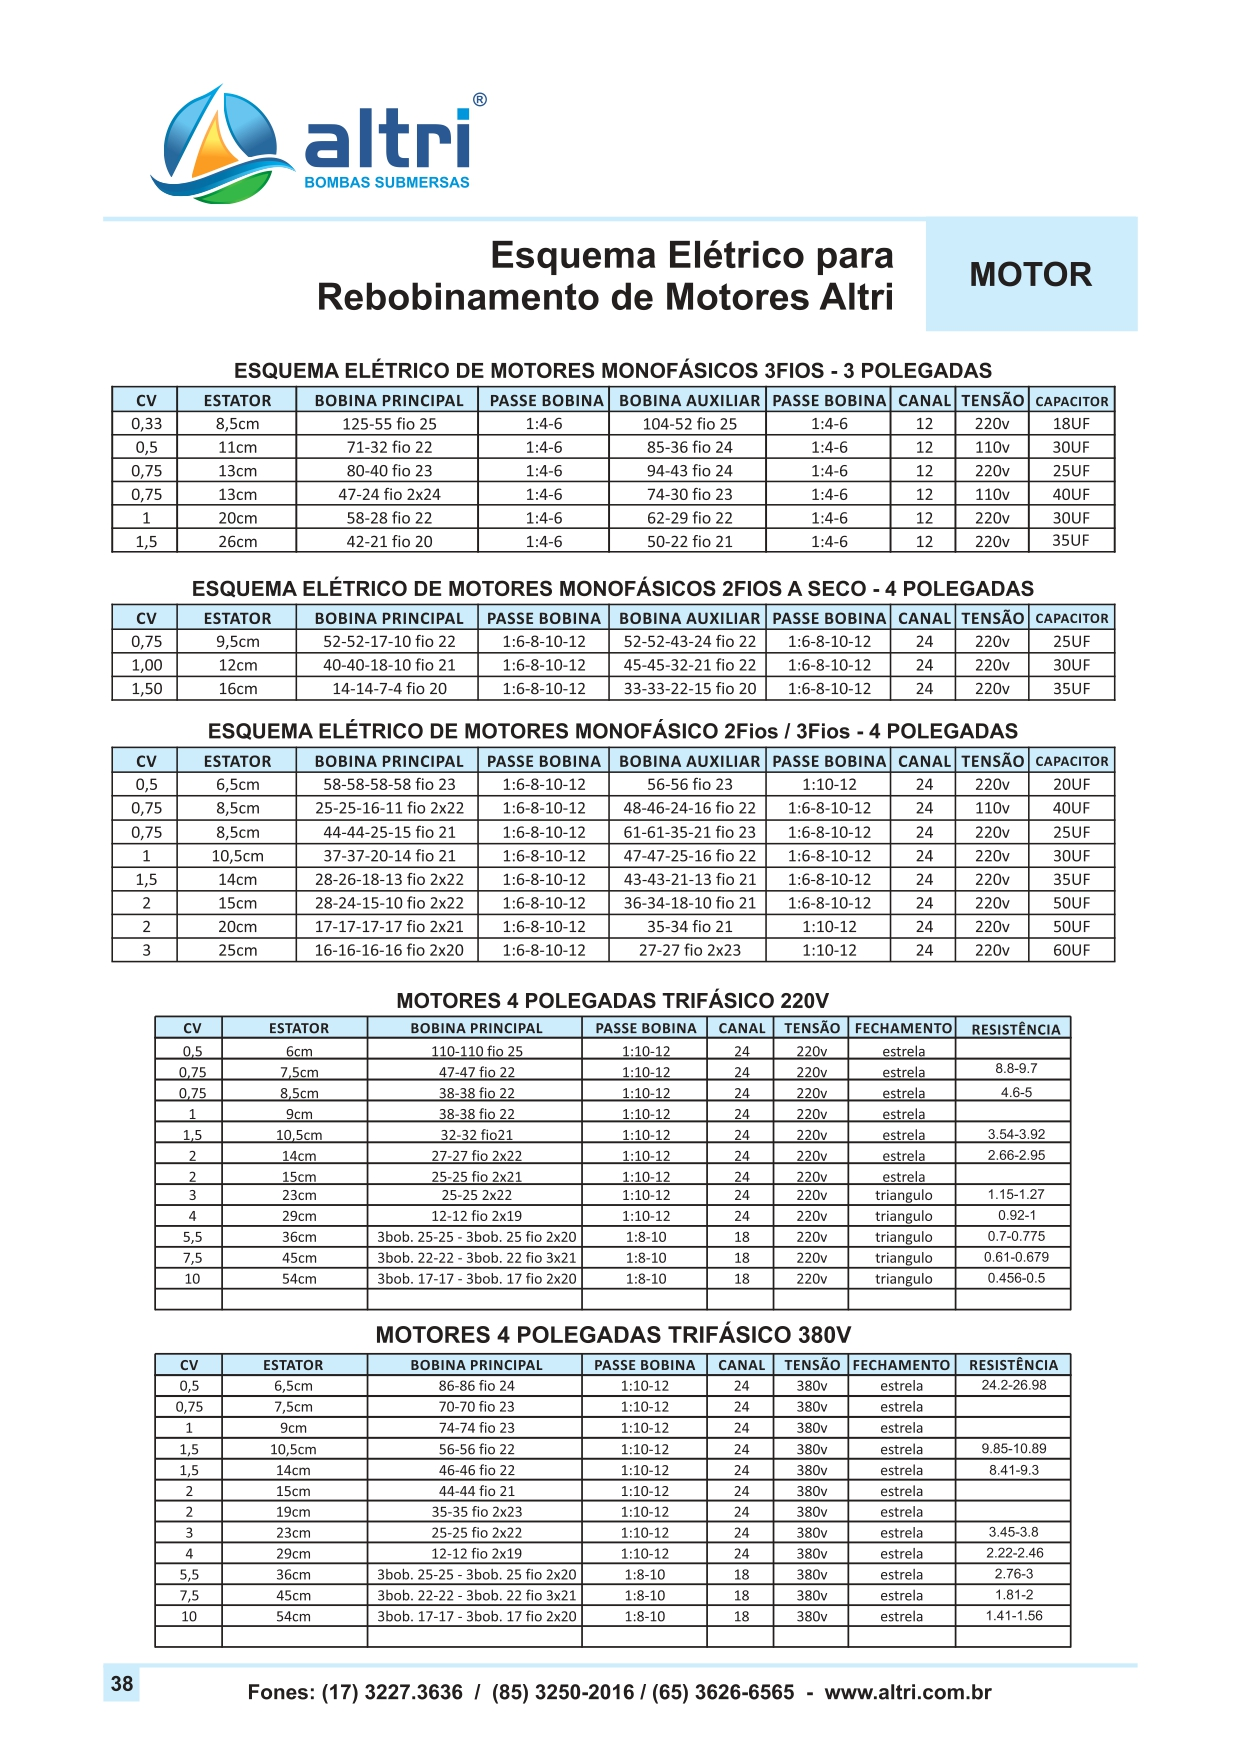 CATALOGO DE PRODUTOS ALTRI 2021 - WEB_page-0040